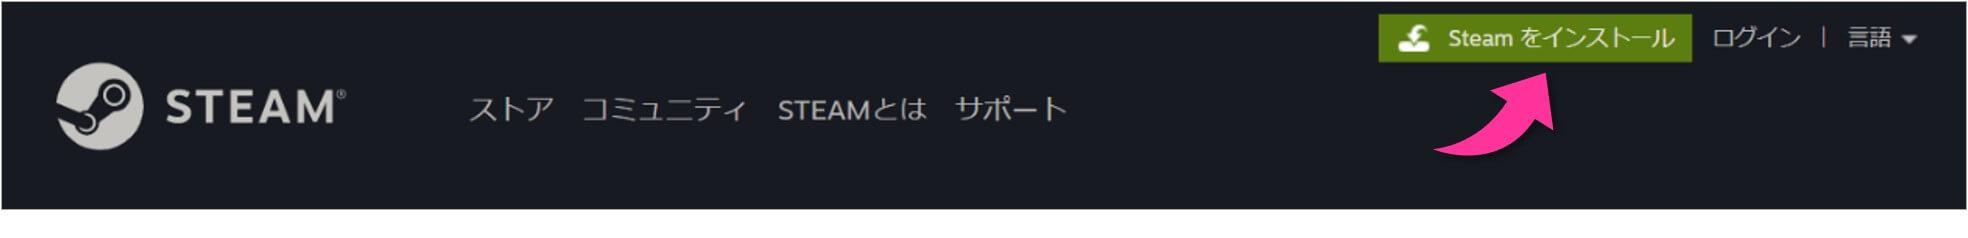 「Steamをインストール」からSteamアプリをインストール